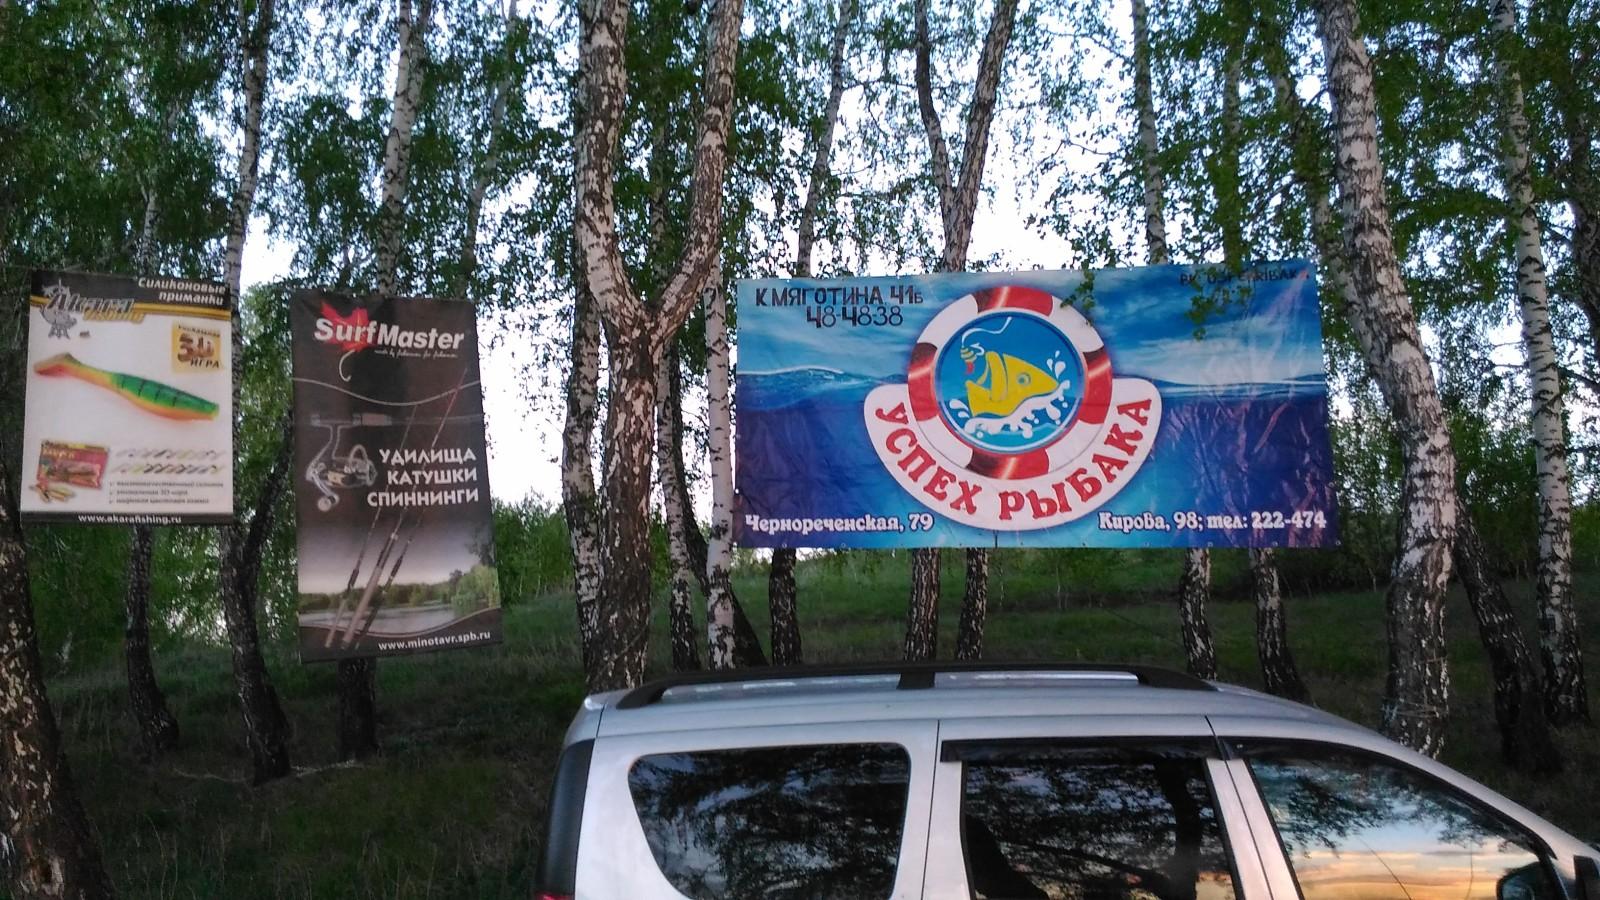 Кубок Курганской области по ловле спиннингом с берега - Страница 3 2v28kuo